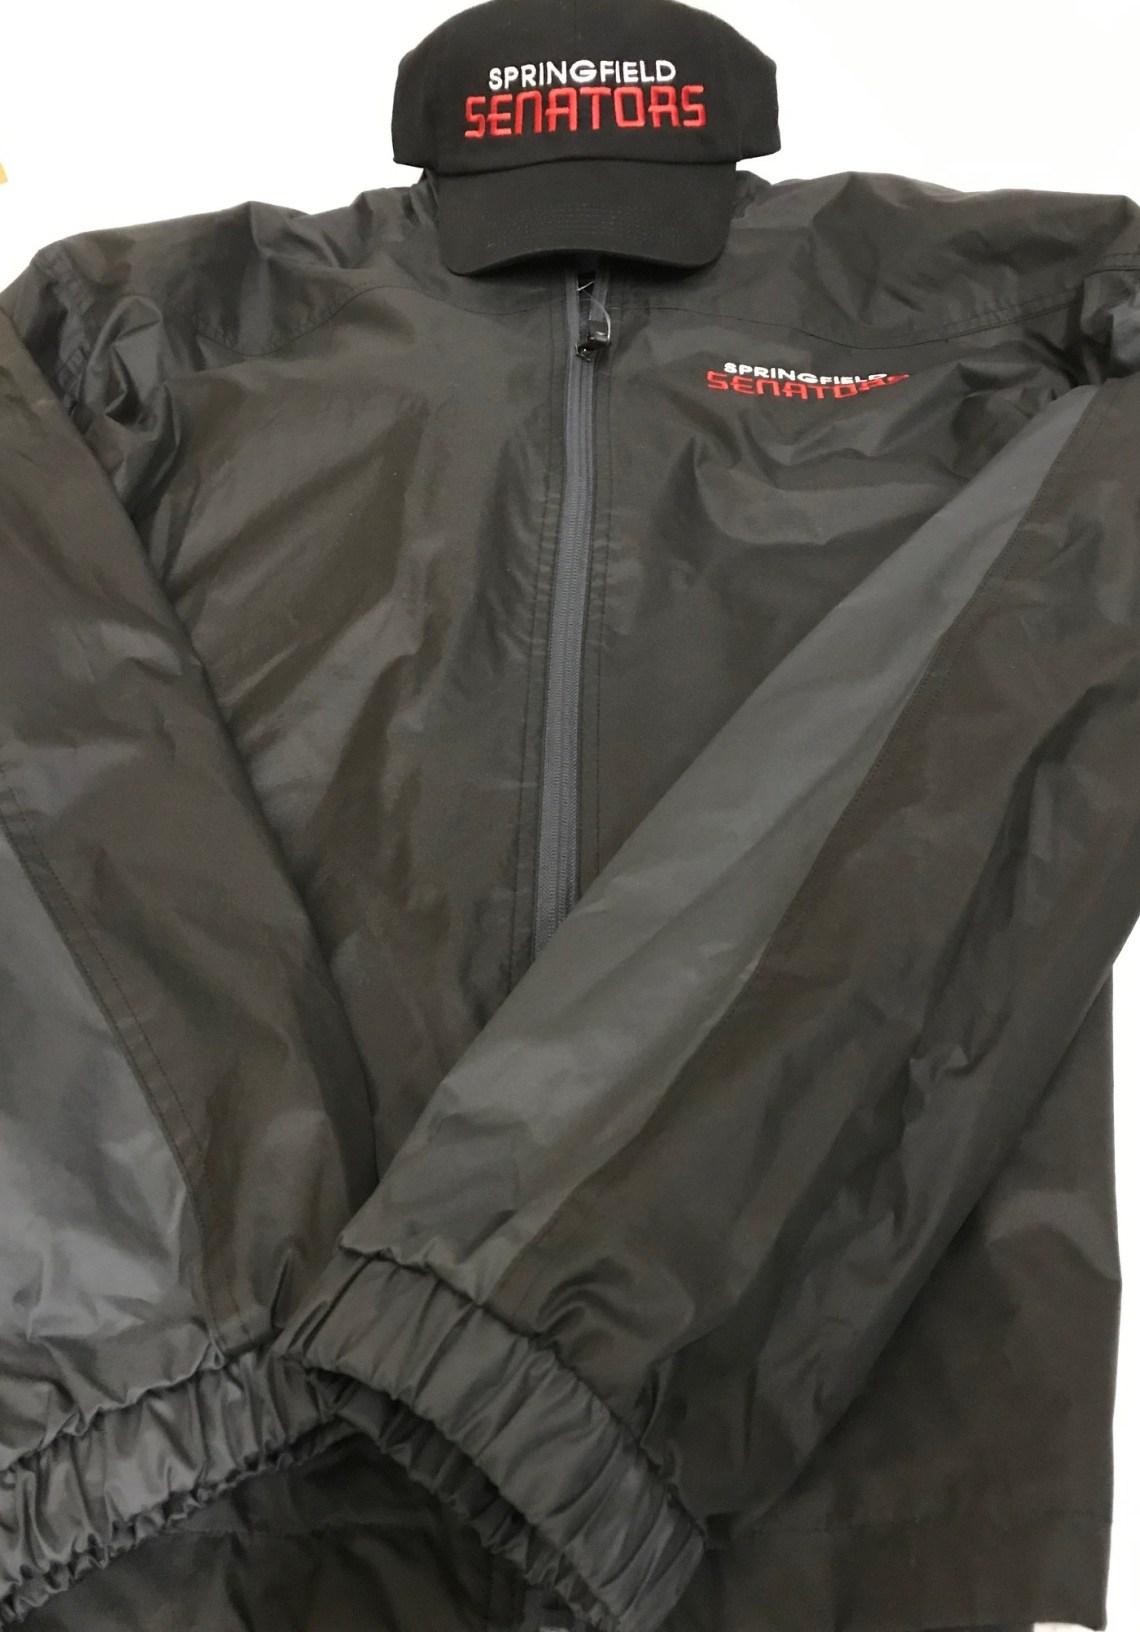 shs jacket